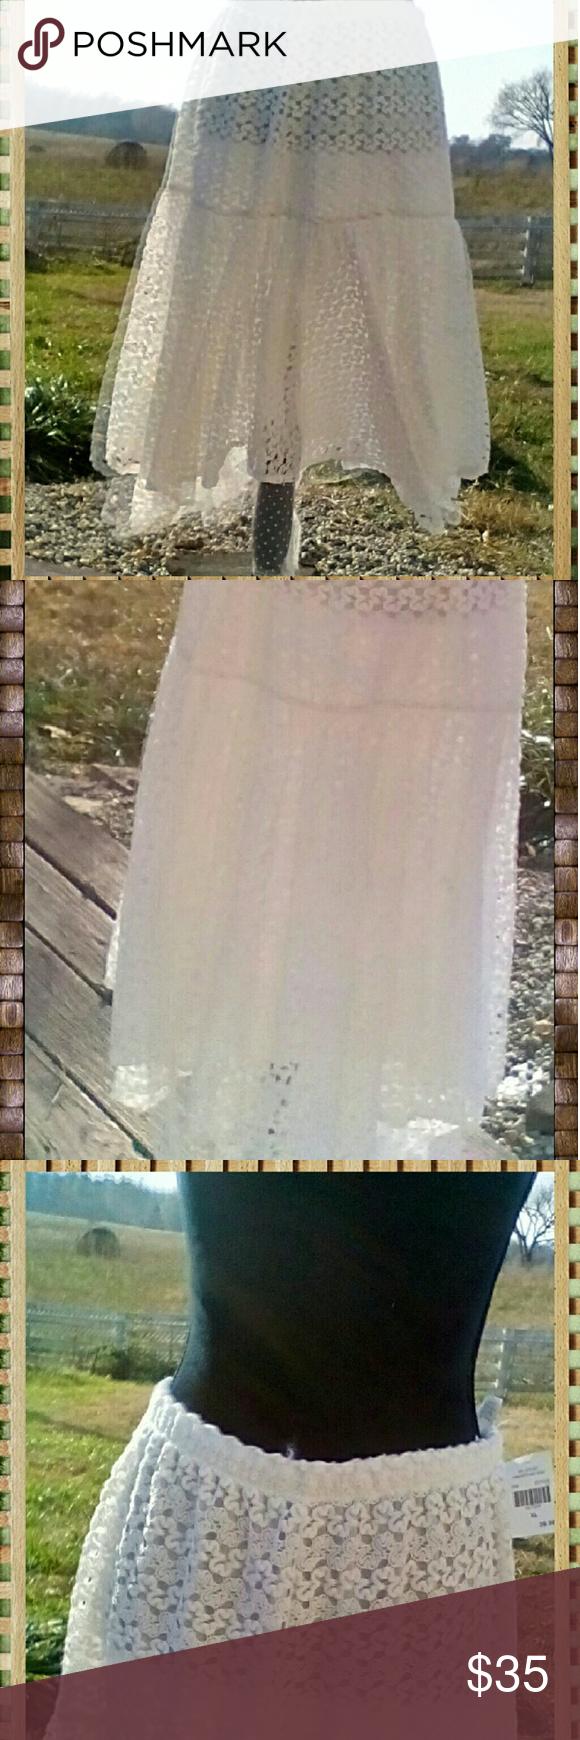 White Lace Asymmetrical Maxi Skirt White lace asymmetrical skirt with open flowe…